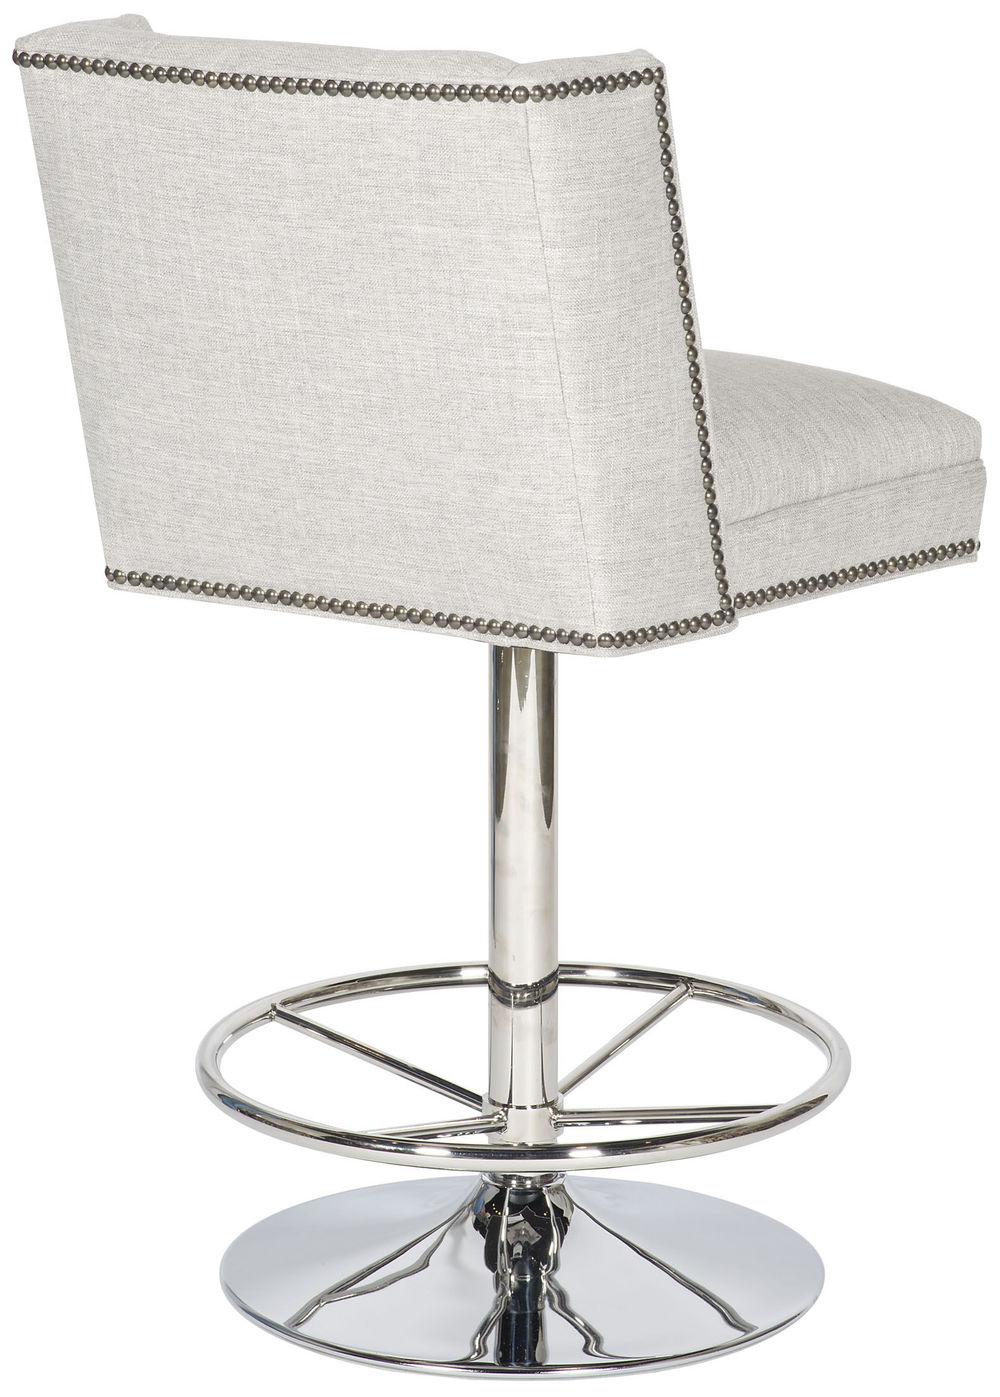 Vanguard Furniture - Enzo Counter Stool